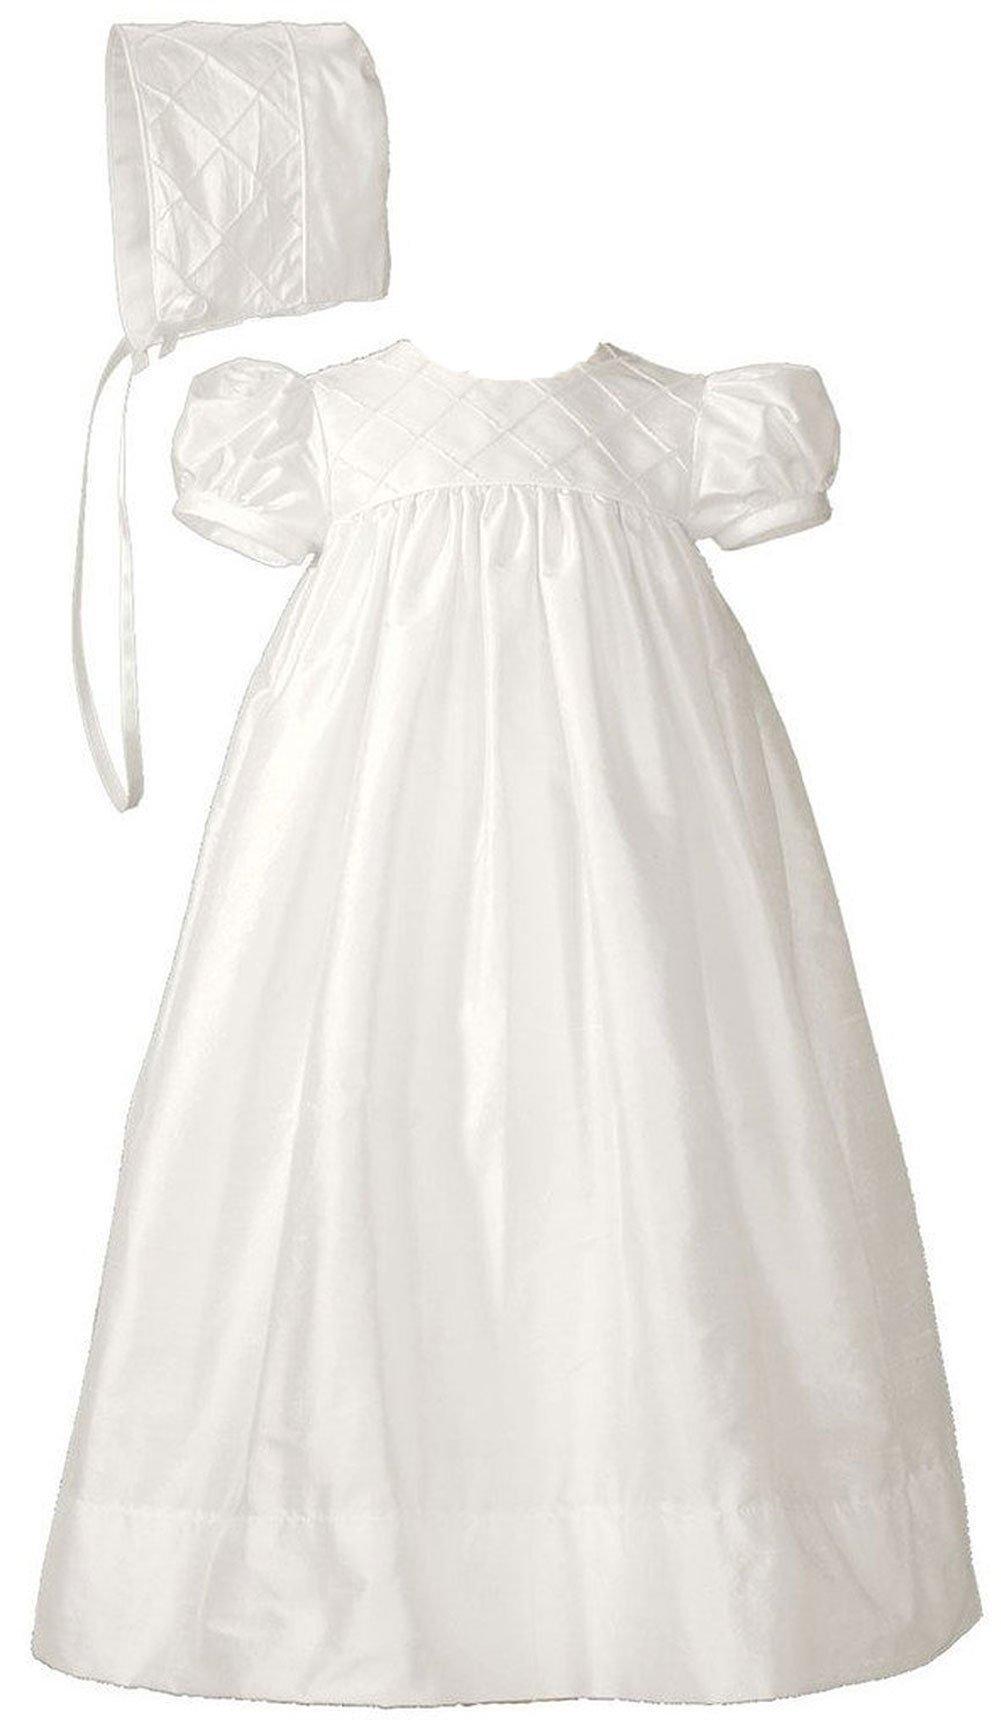 26'' Girls Silk Dupioni Dress Baptism Gown with Lattice Bodice 6M